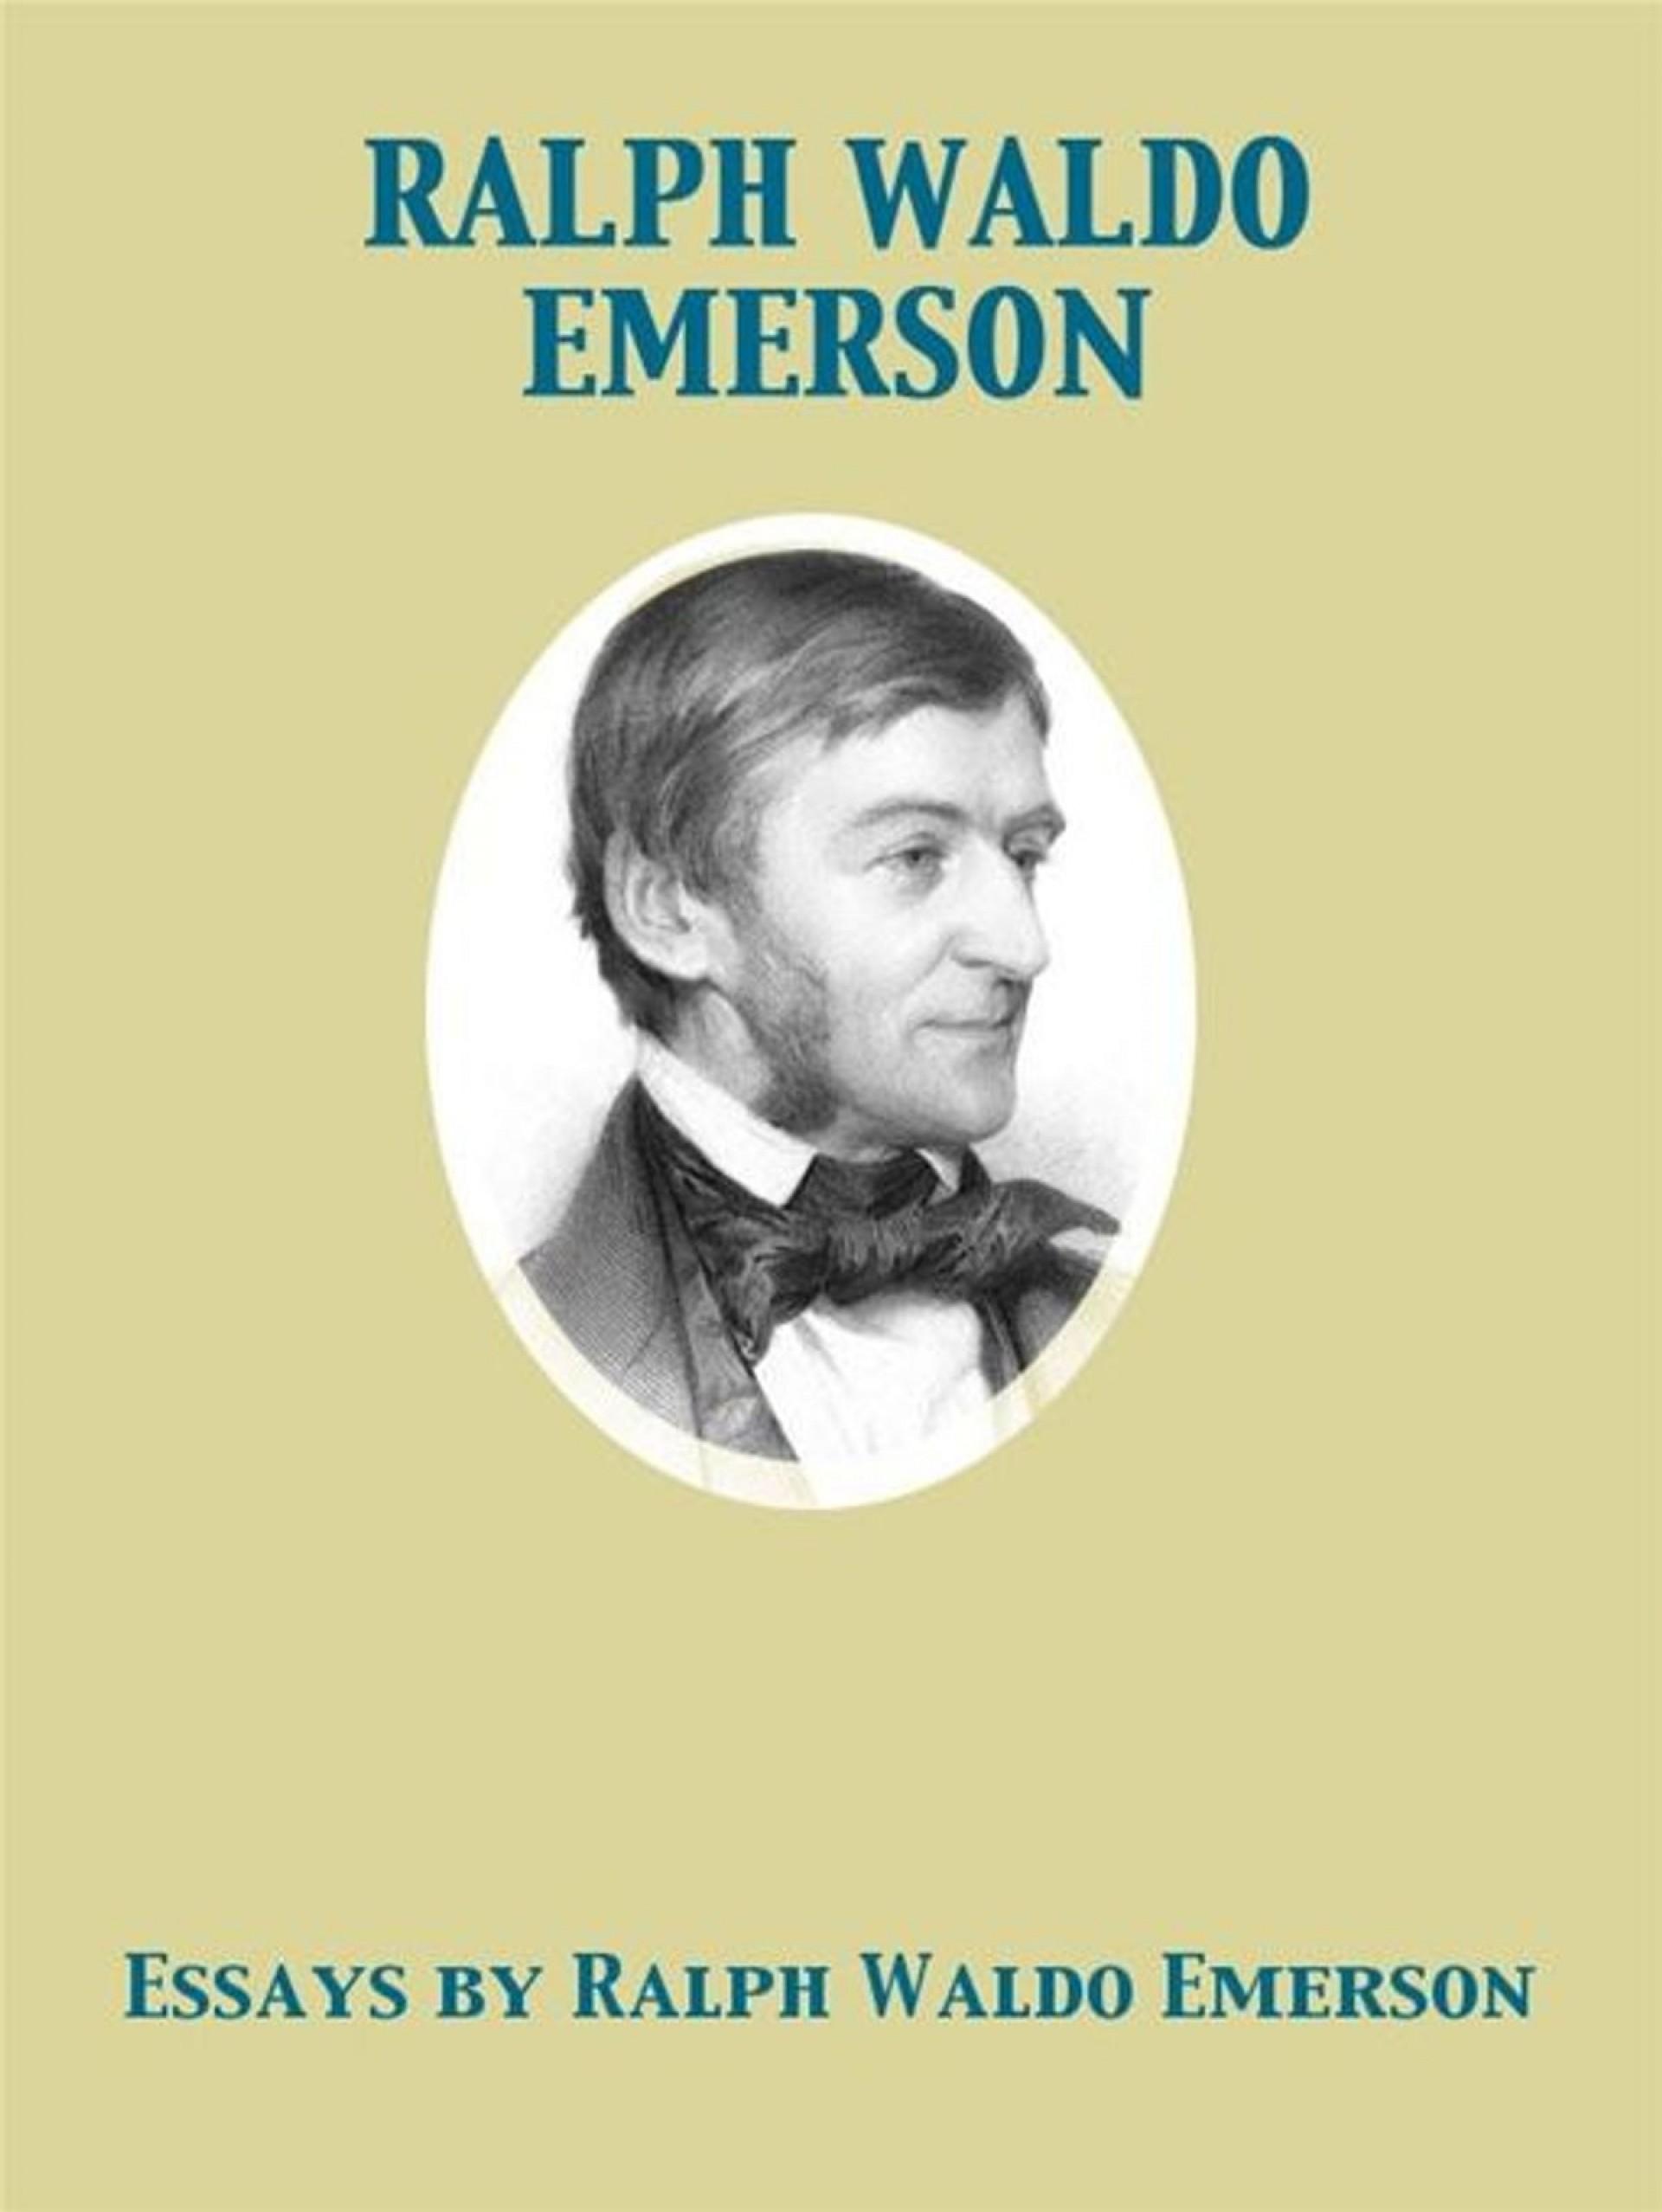 008 Emerson Essays By Ralph Waldo Essay Dreaded Pdf First Series Summary Nature 1920